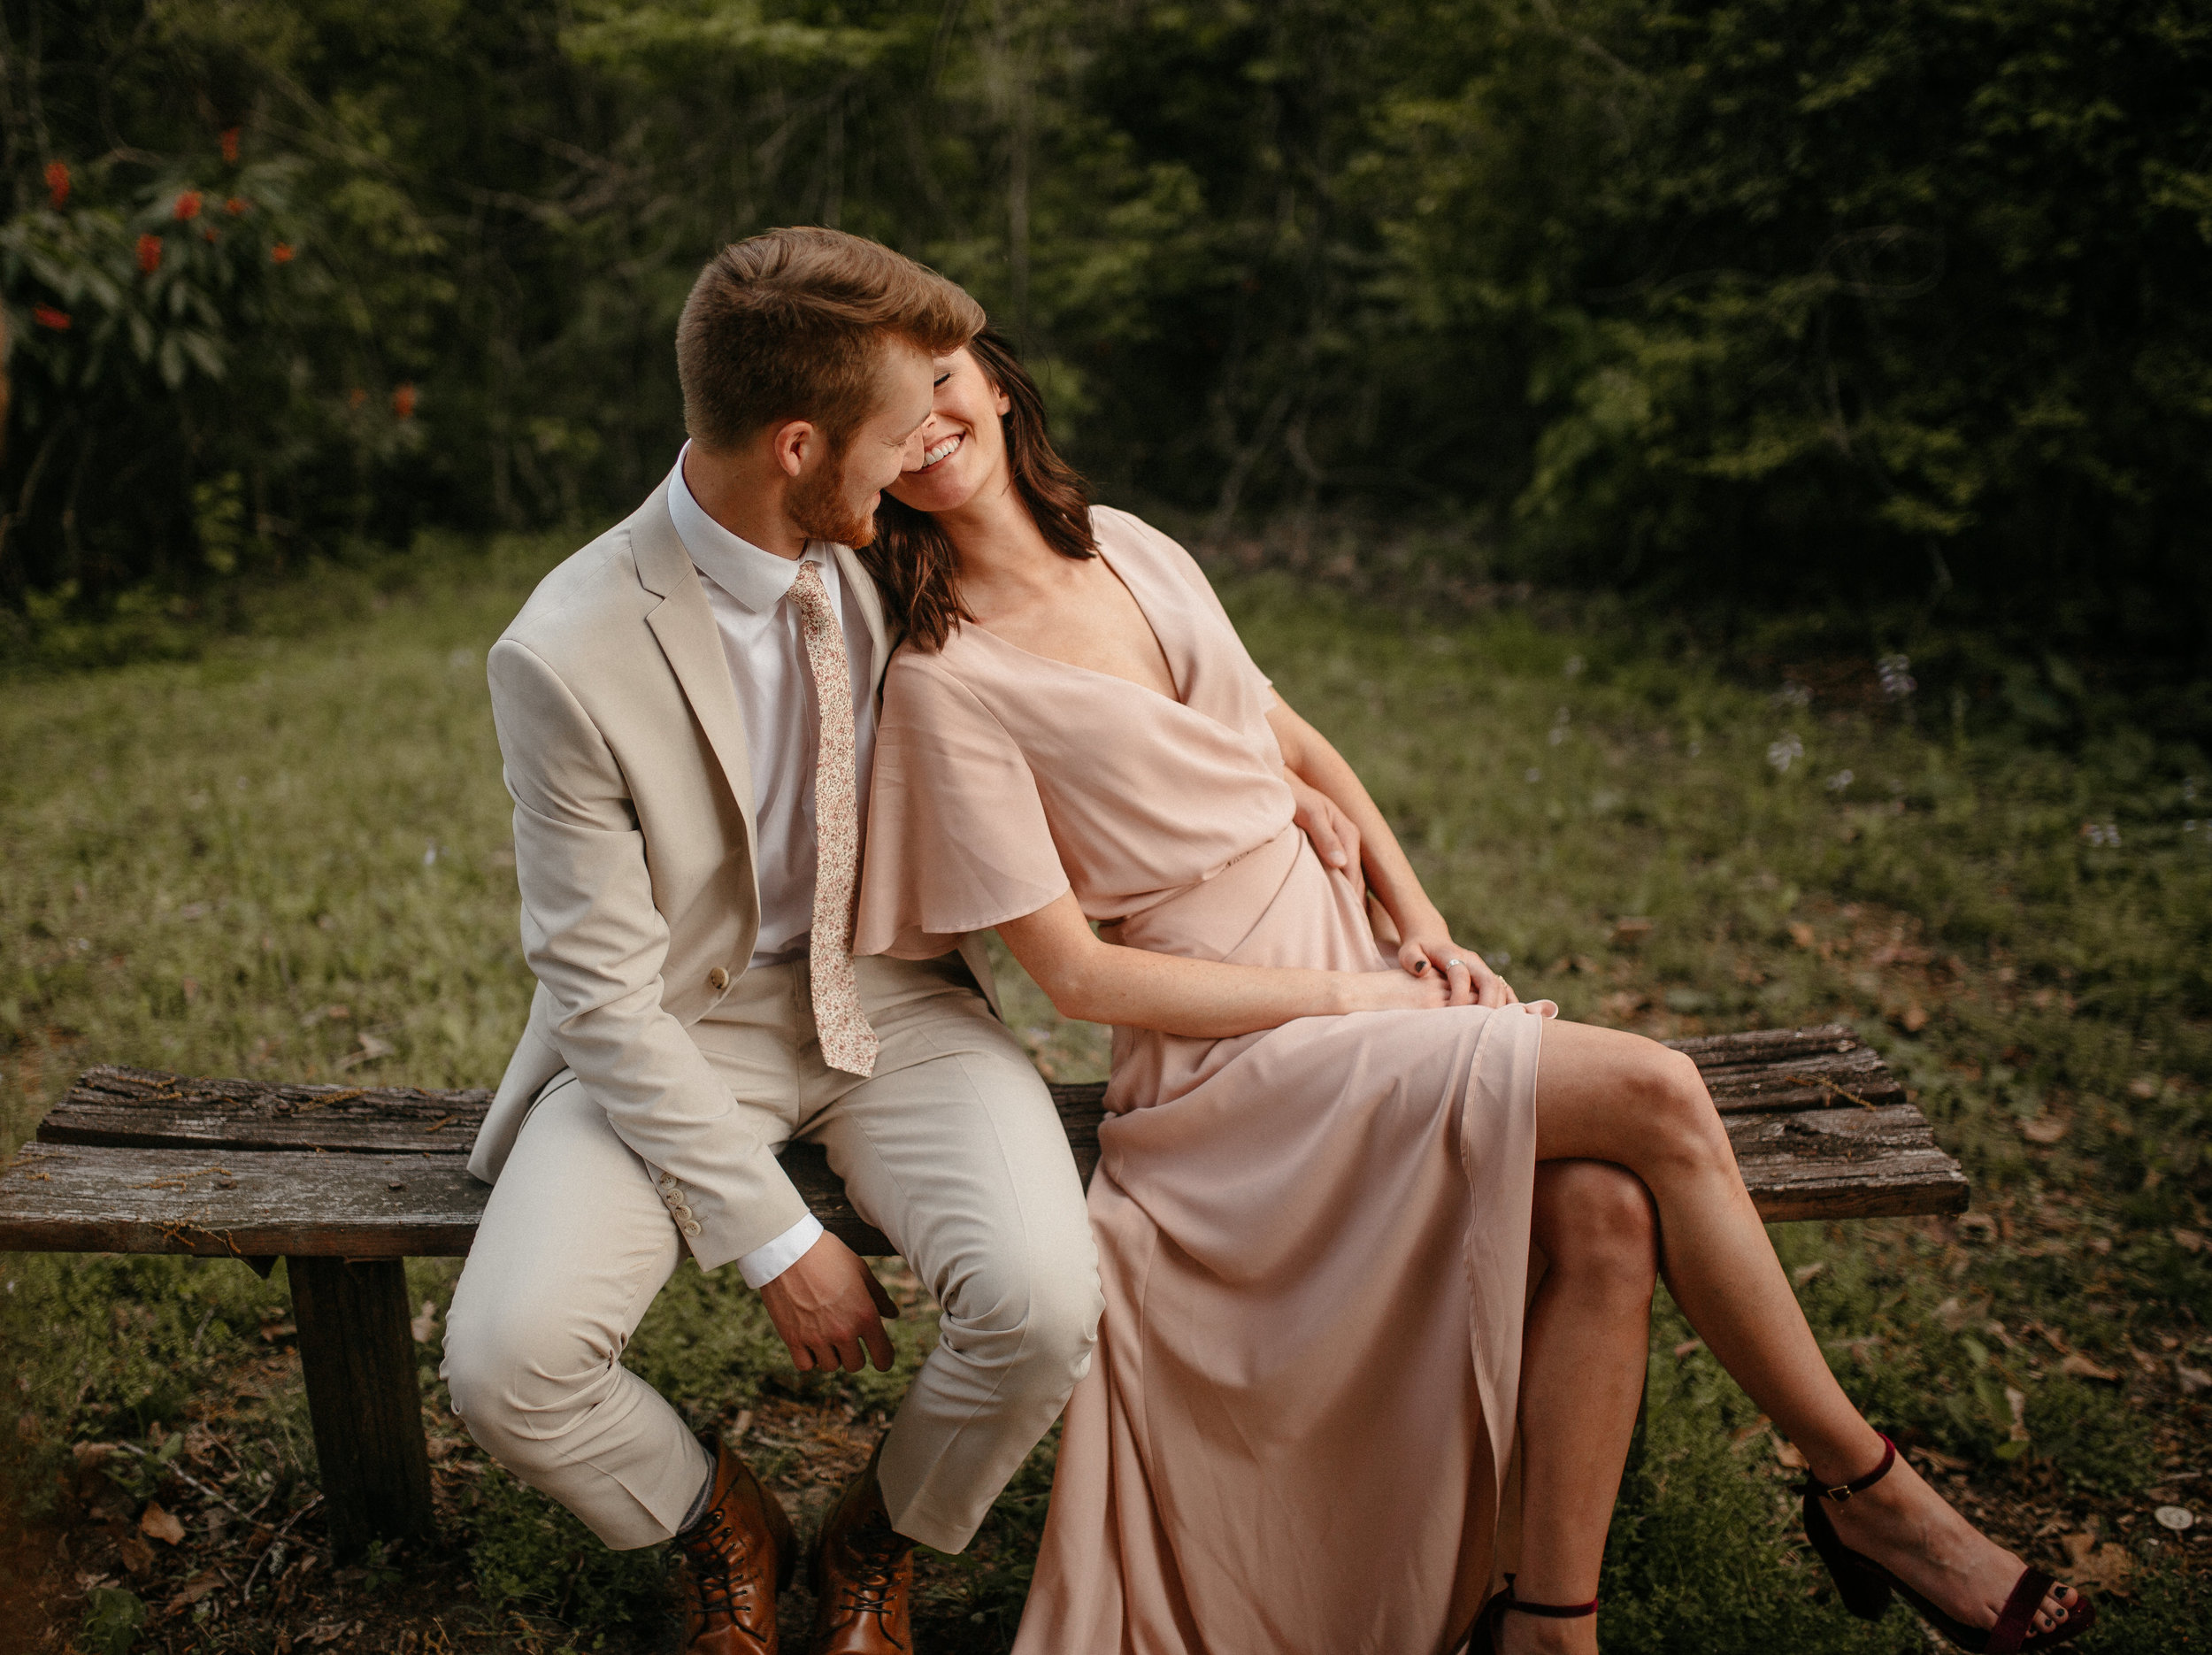 memphis-tennessee-wedding-photographer-the-hatches-utah-colorado-washington-arizona-oregon-yosemite-national-park-elopement-adventure-emotional-journalistic-spring-florals-colorful-intimate